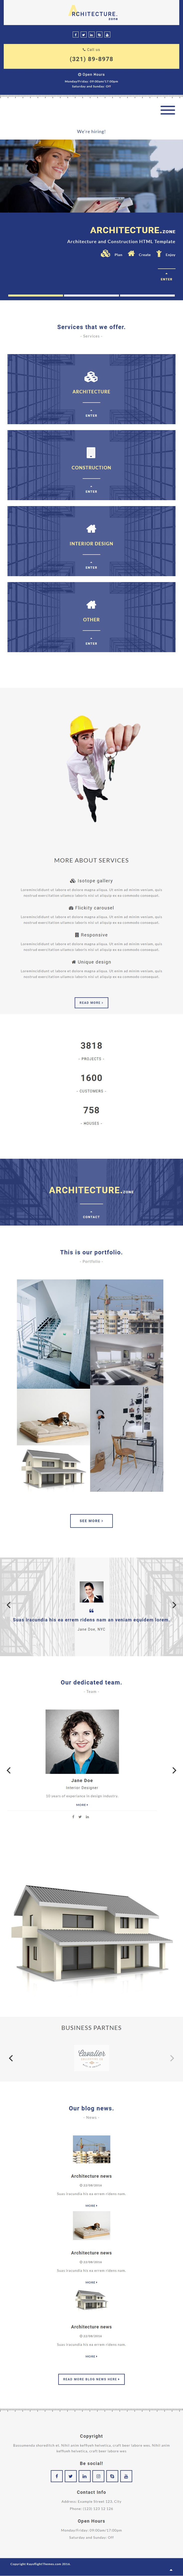 Architecture Zone Premium Responisve Architecture And